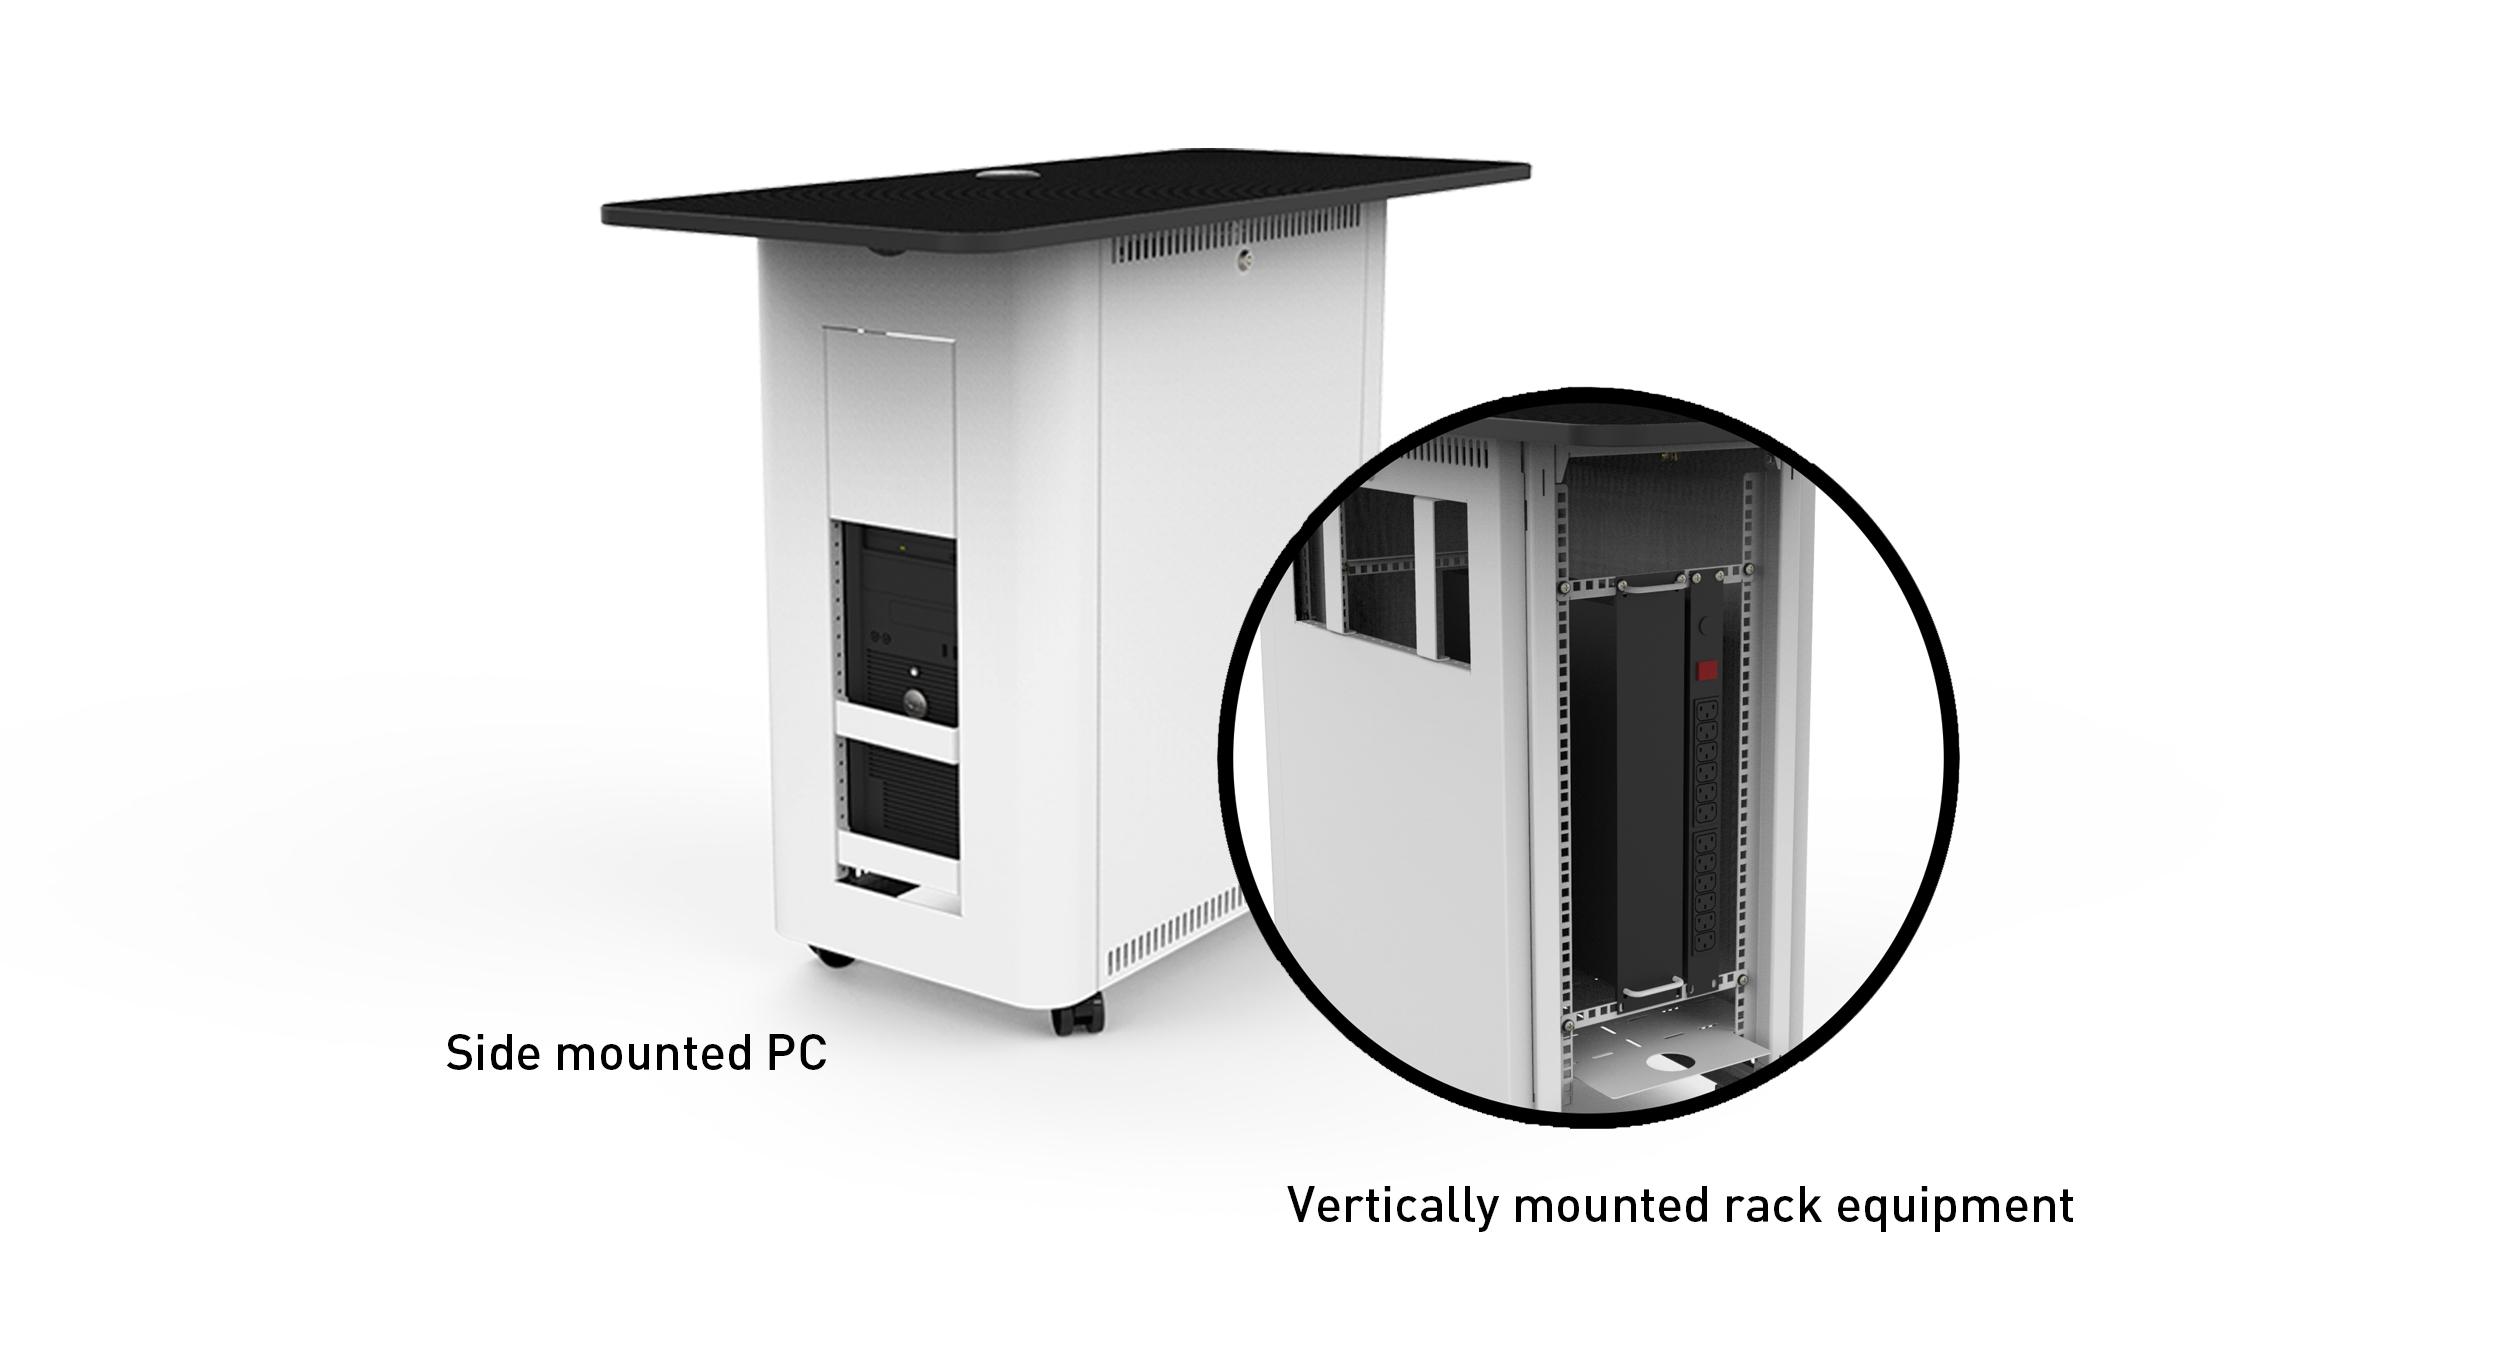 Vertically mounted rack equipment